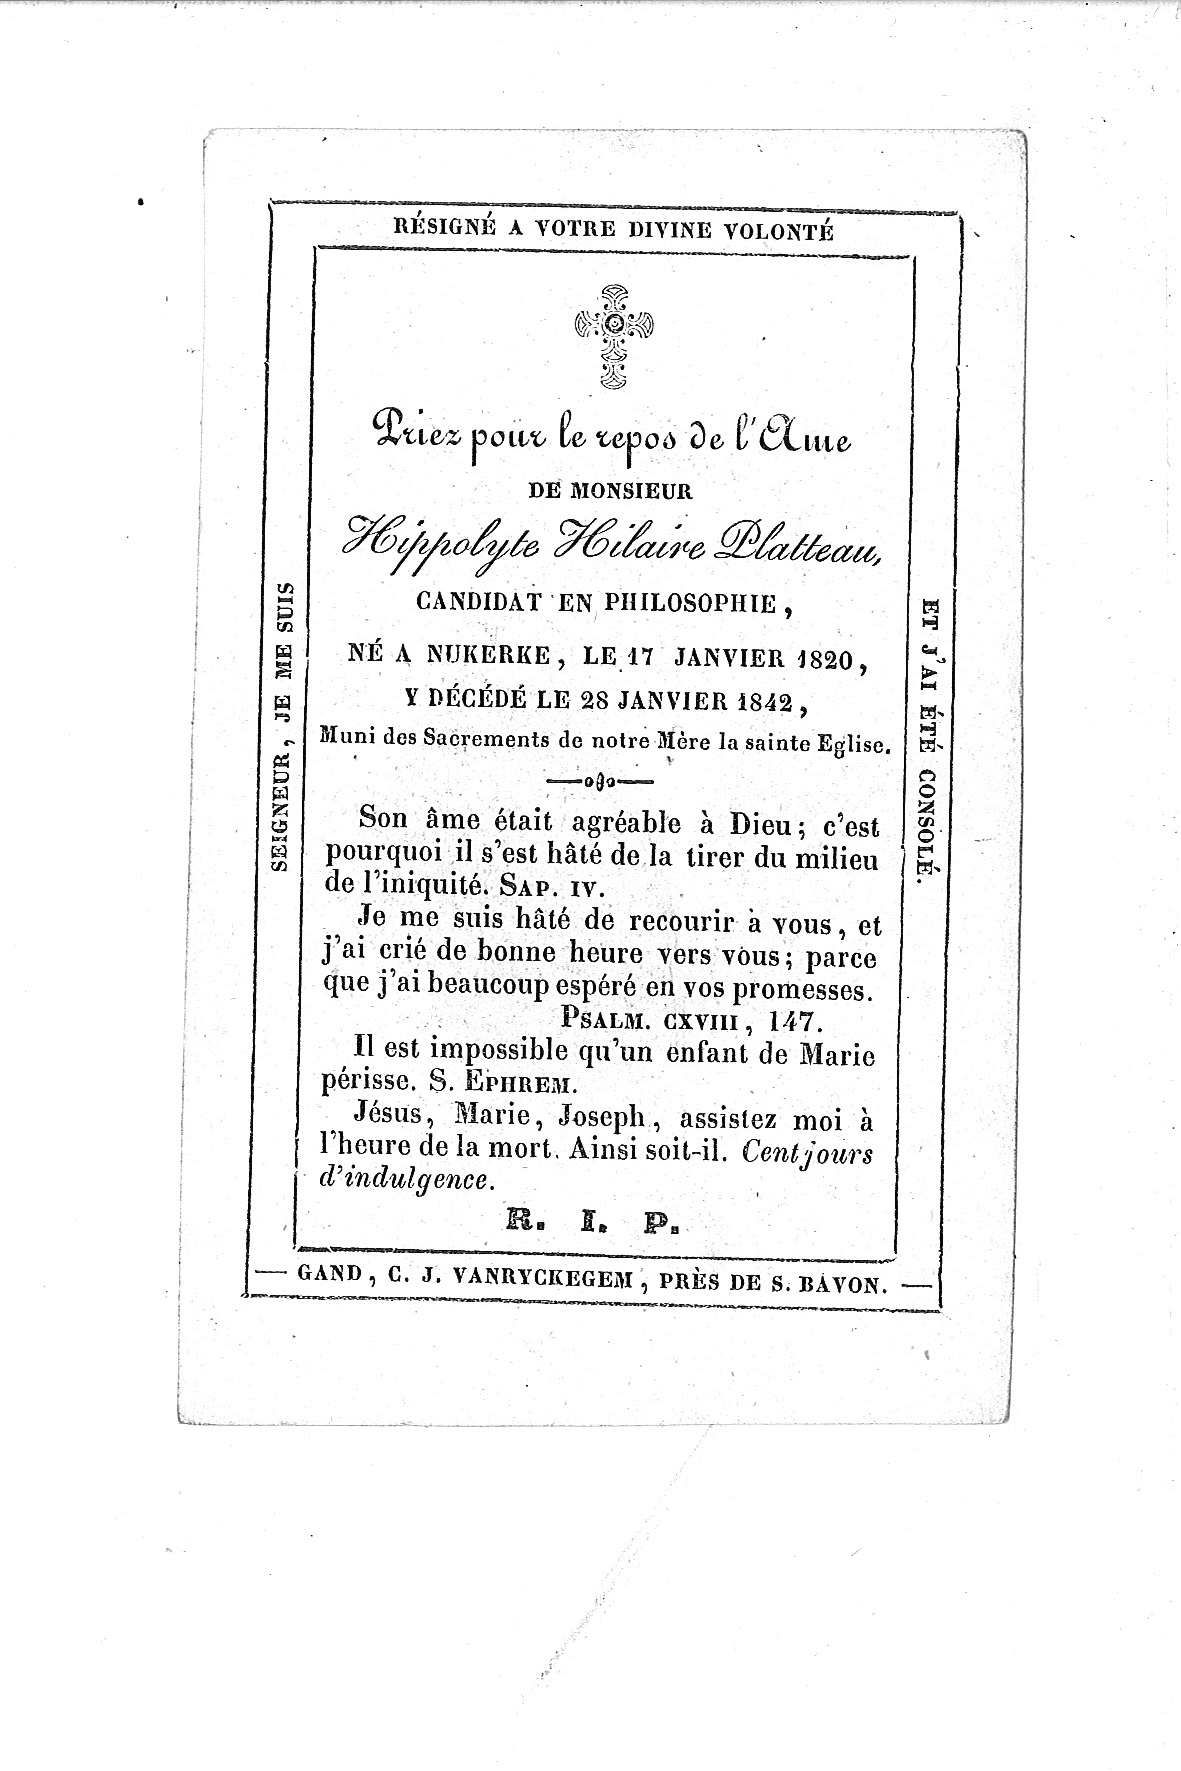 Hippolyte-Hilaire(1842)20100415131555_00020.jpg